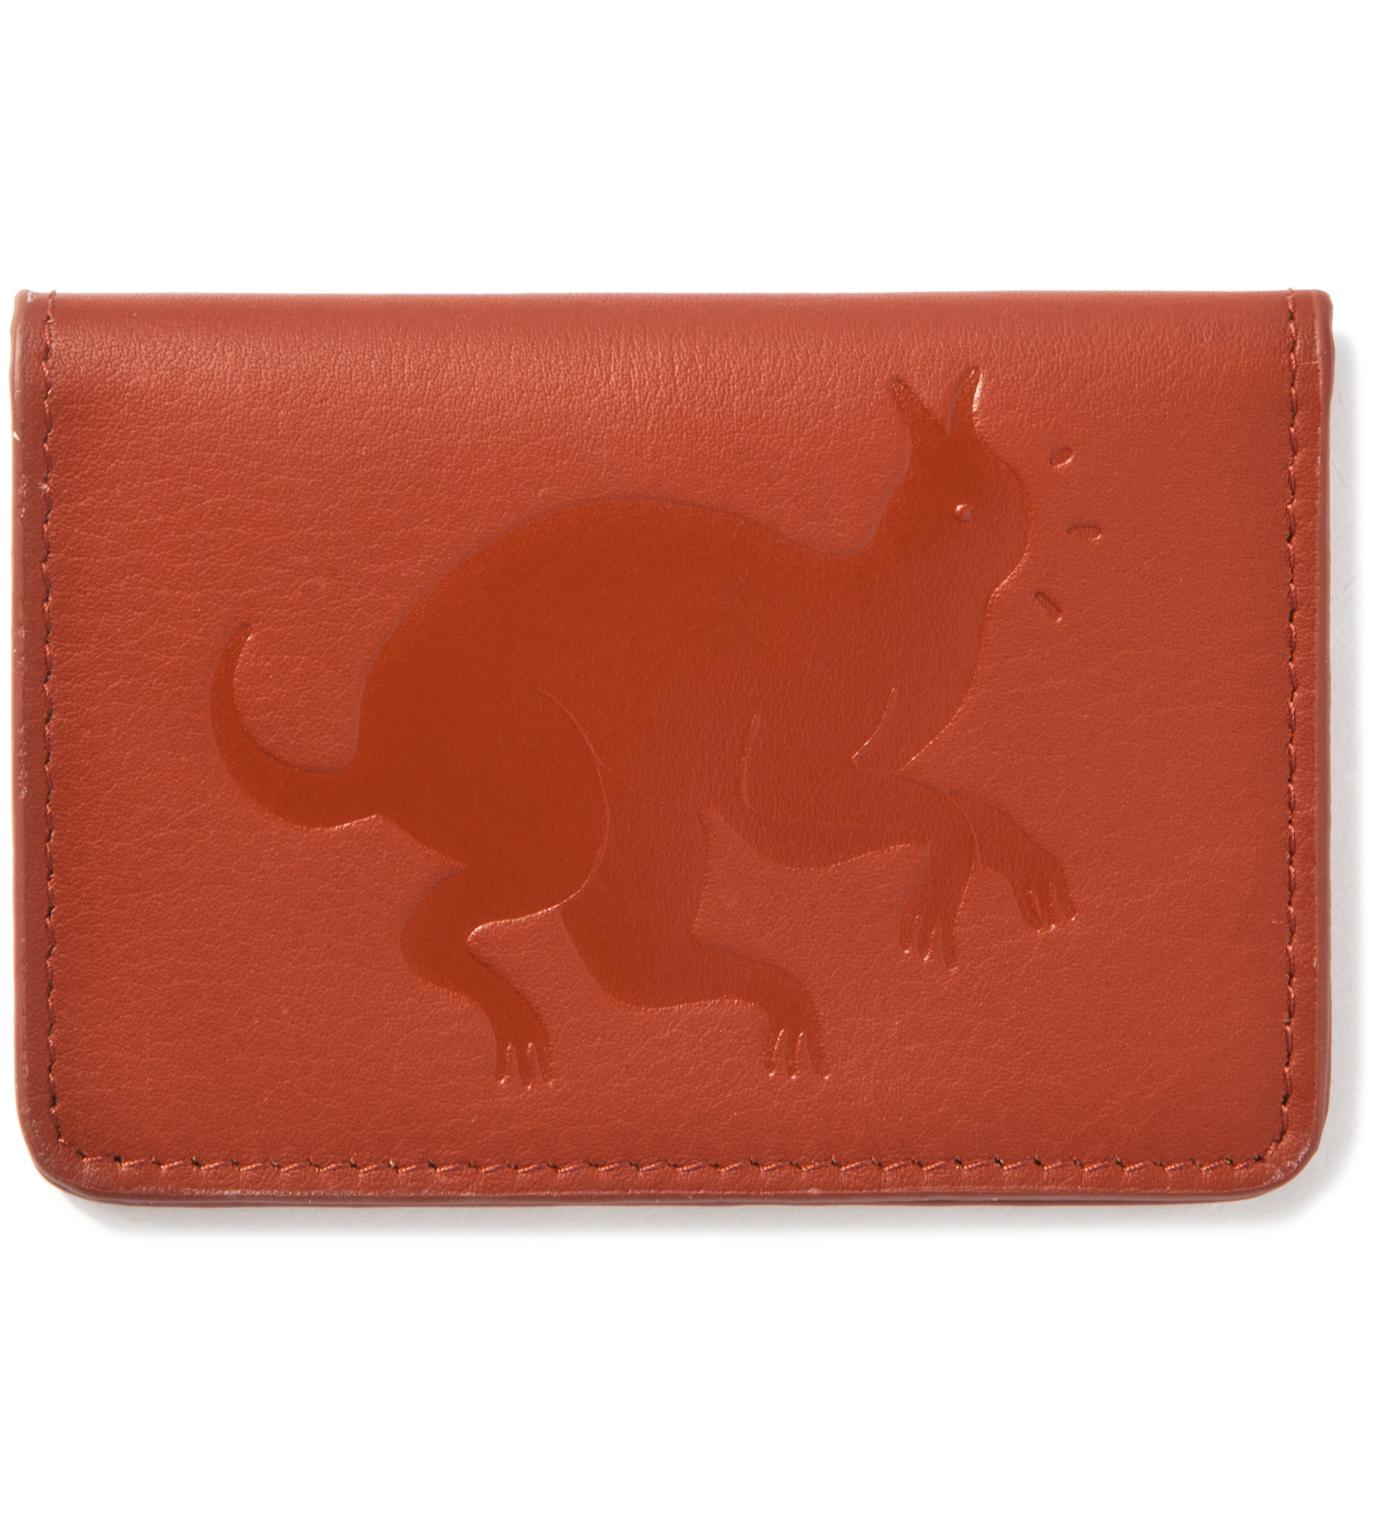 Parra Brown Leather Card Holder